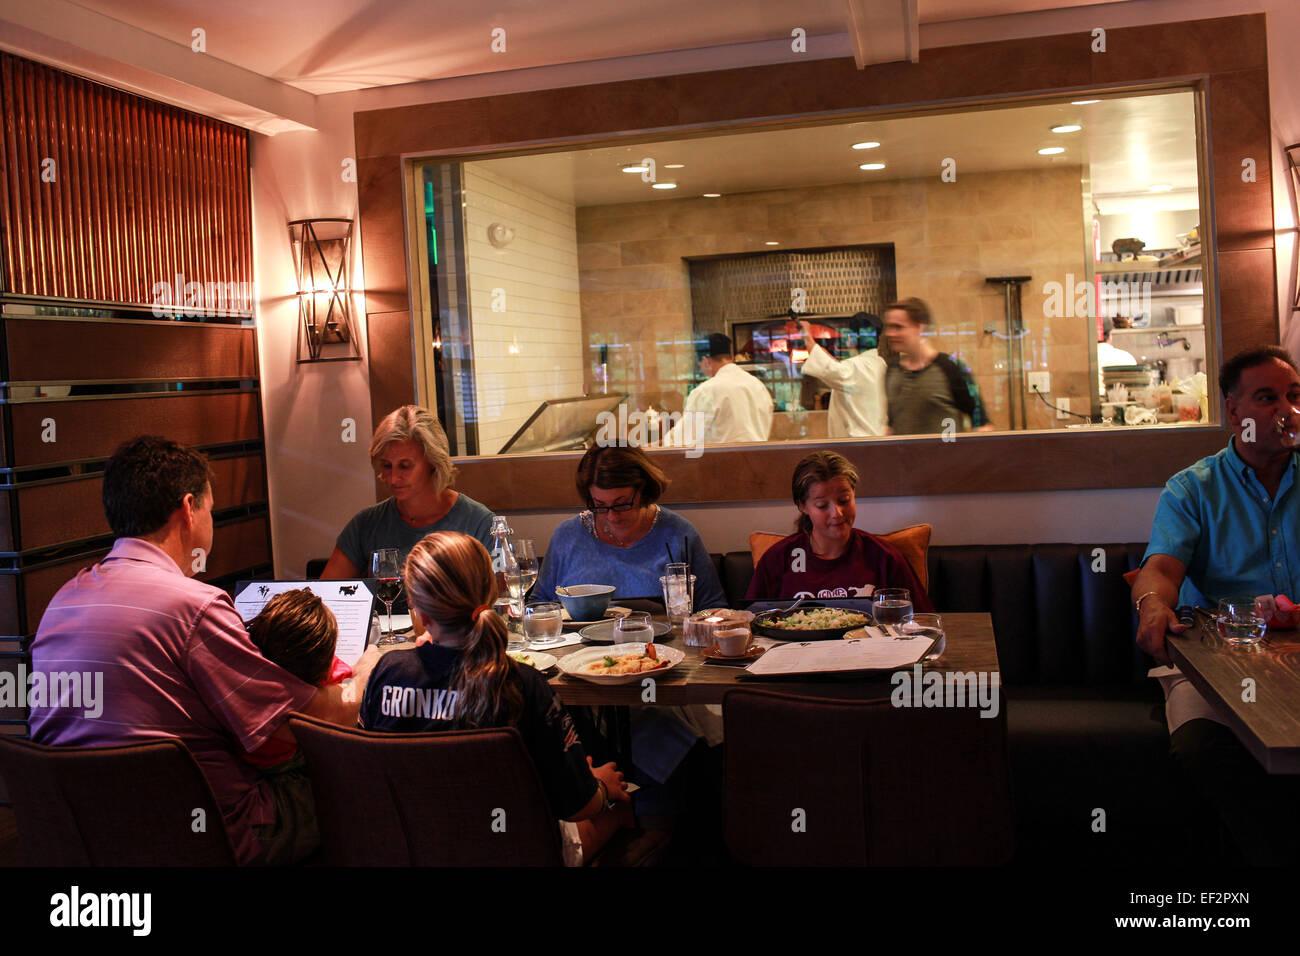 Customers dining at One Twenty One Restaurant in North Salem, NY. Stock Photo